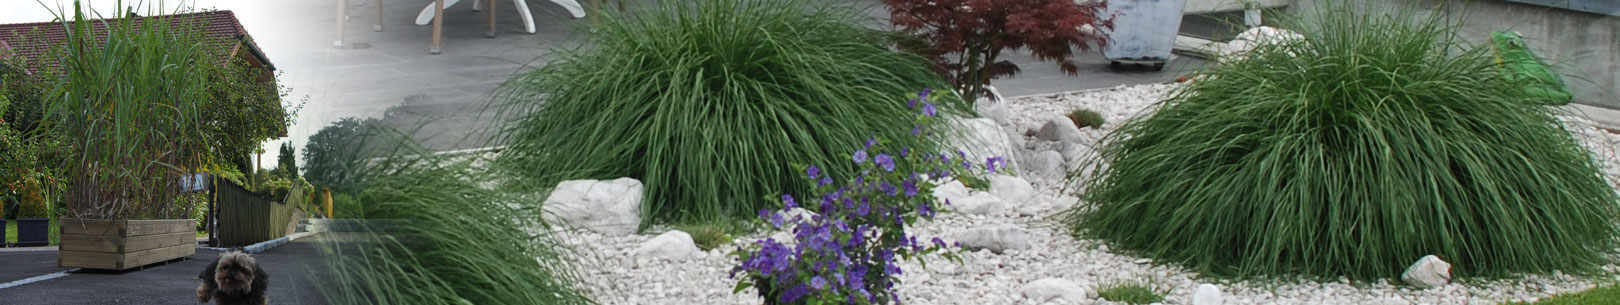 jumbograshecke-pflanzen-balkon-terasse